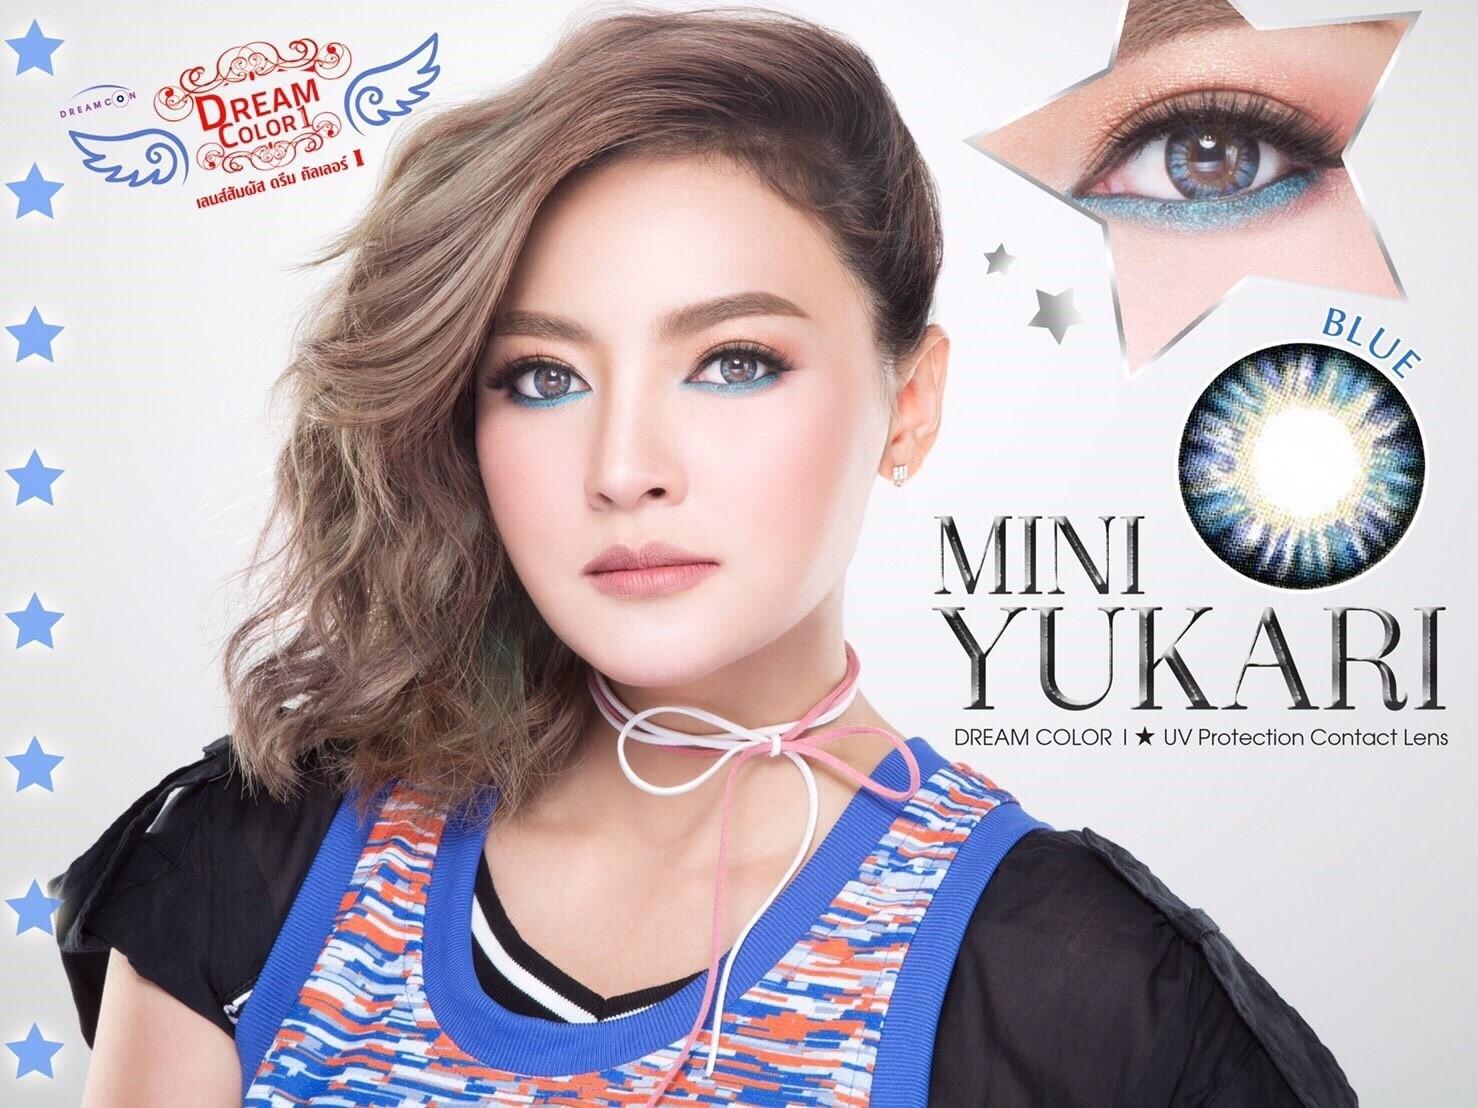 Mini Yukari Dreamcolor1 เลนส์ 4 โทน